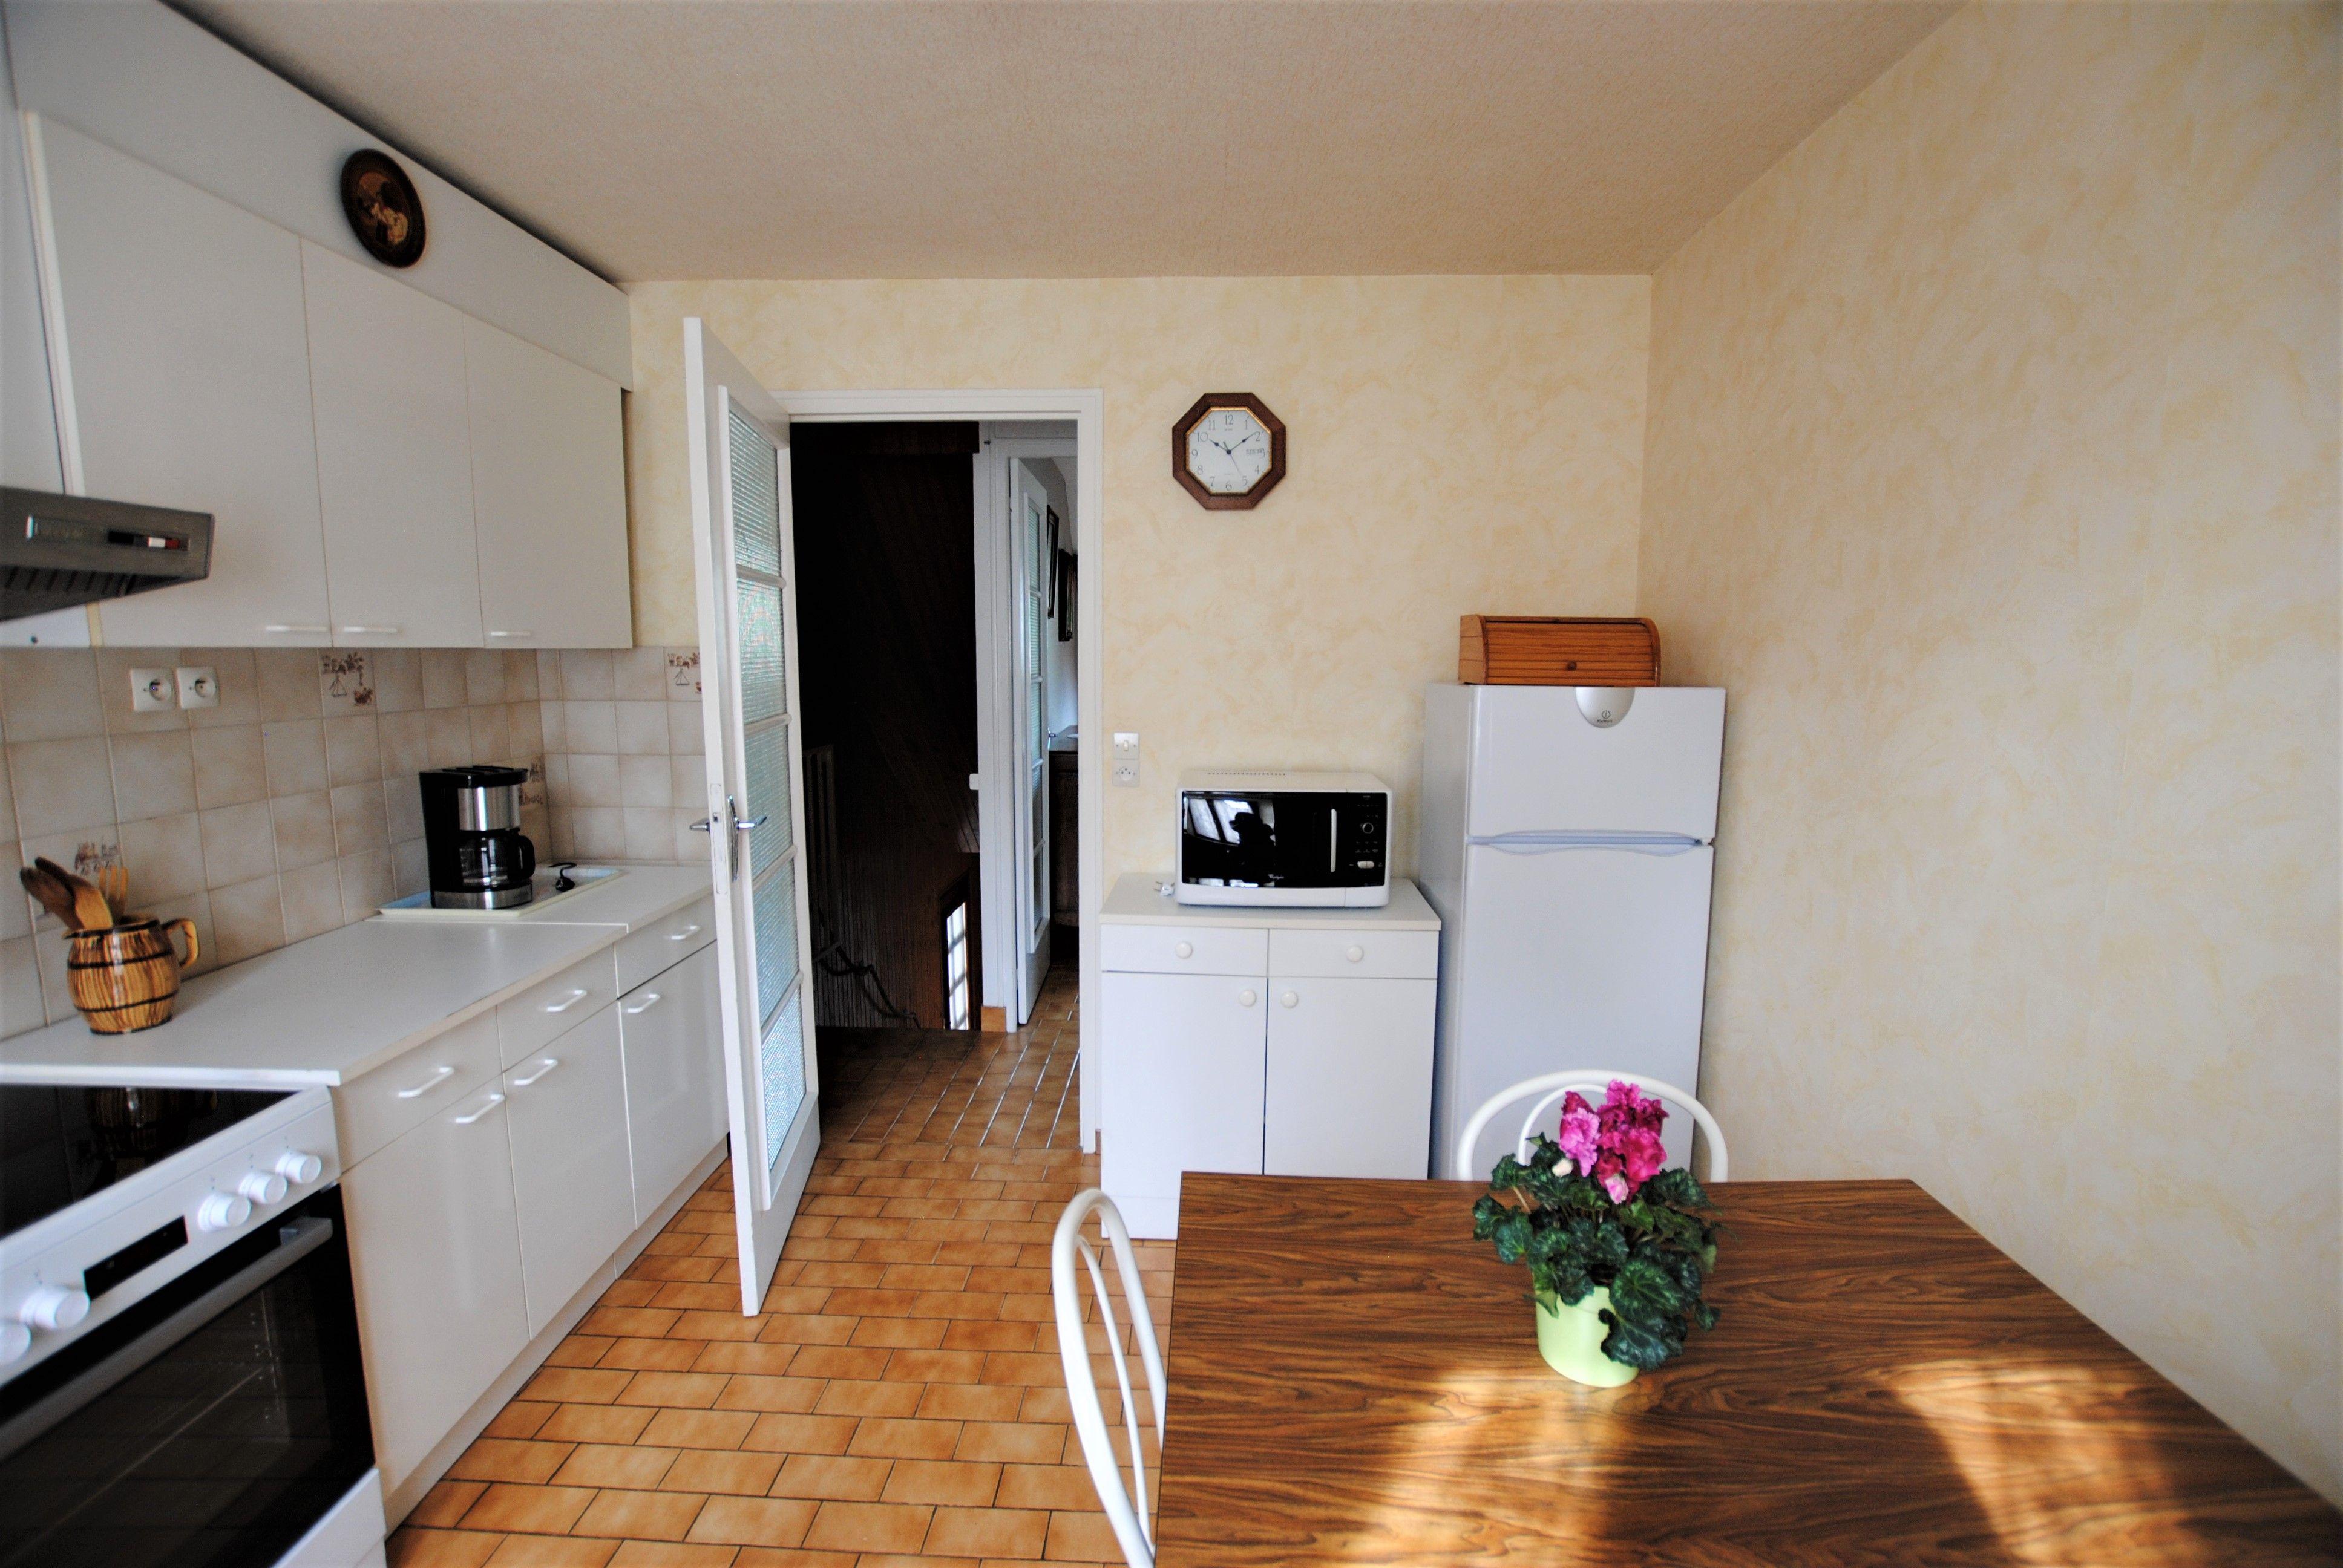 51G172 - Passy Grigny - Gîtes de France Marne